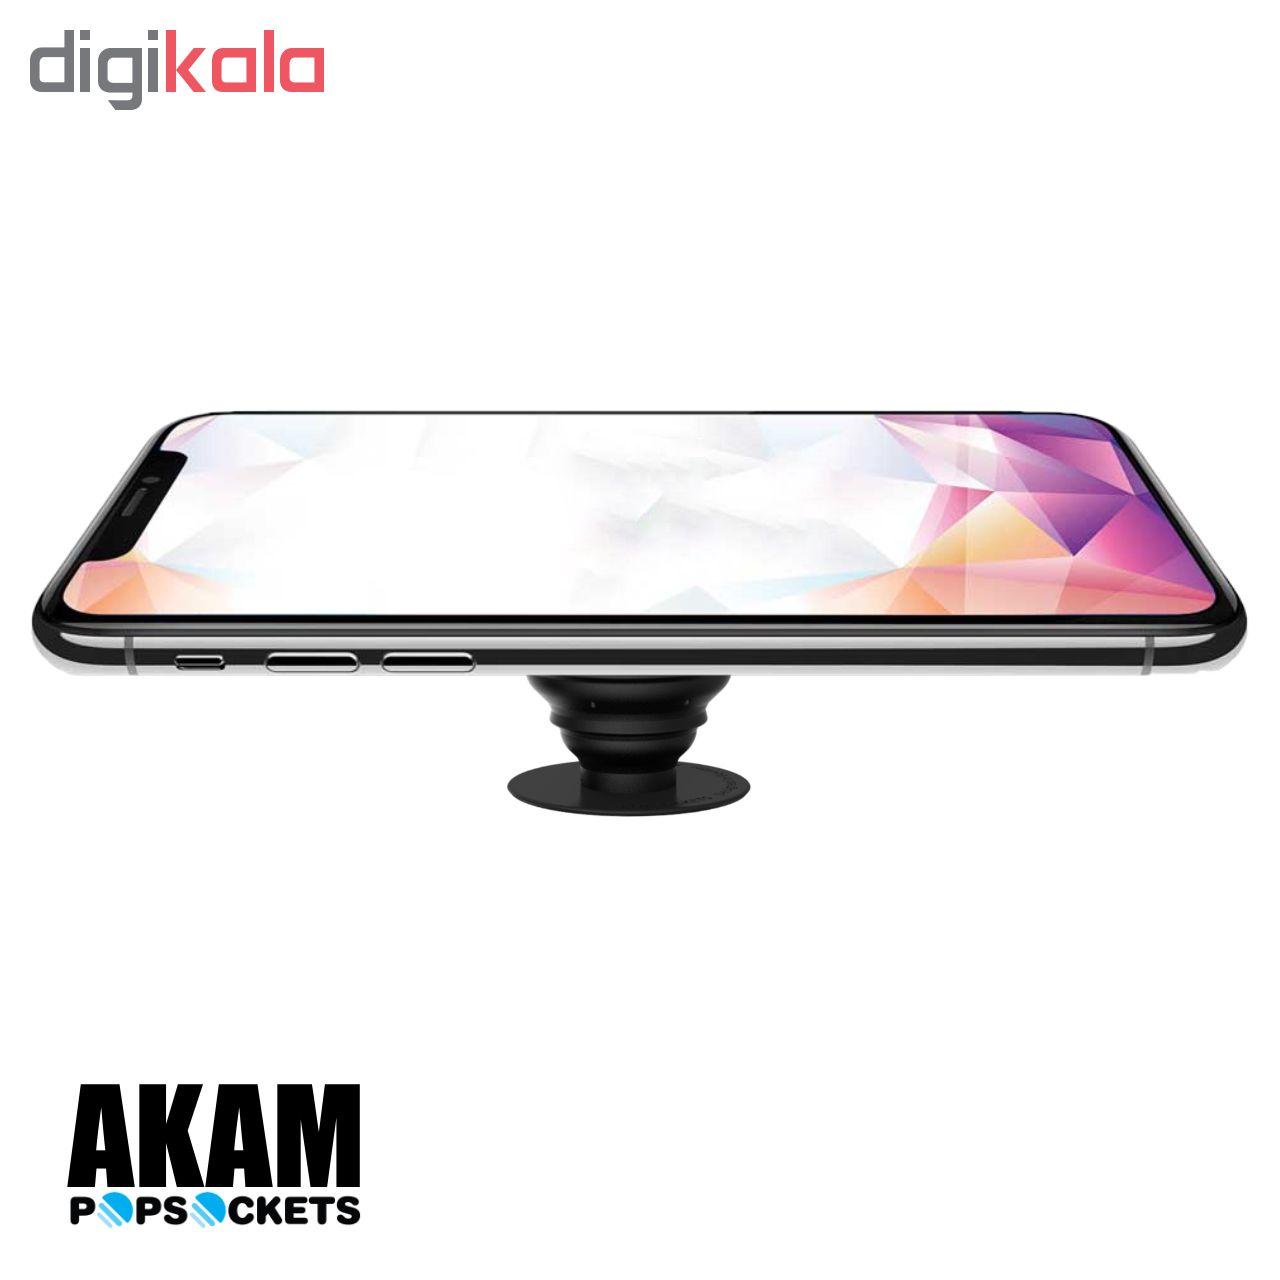 پایه نگهدارنده گوشی موبایل پاپ سوکت آکام مدل APS0191 main 1 9